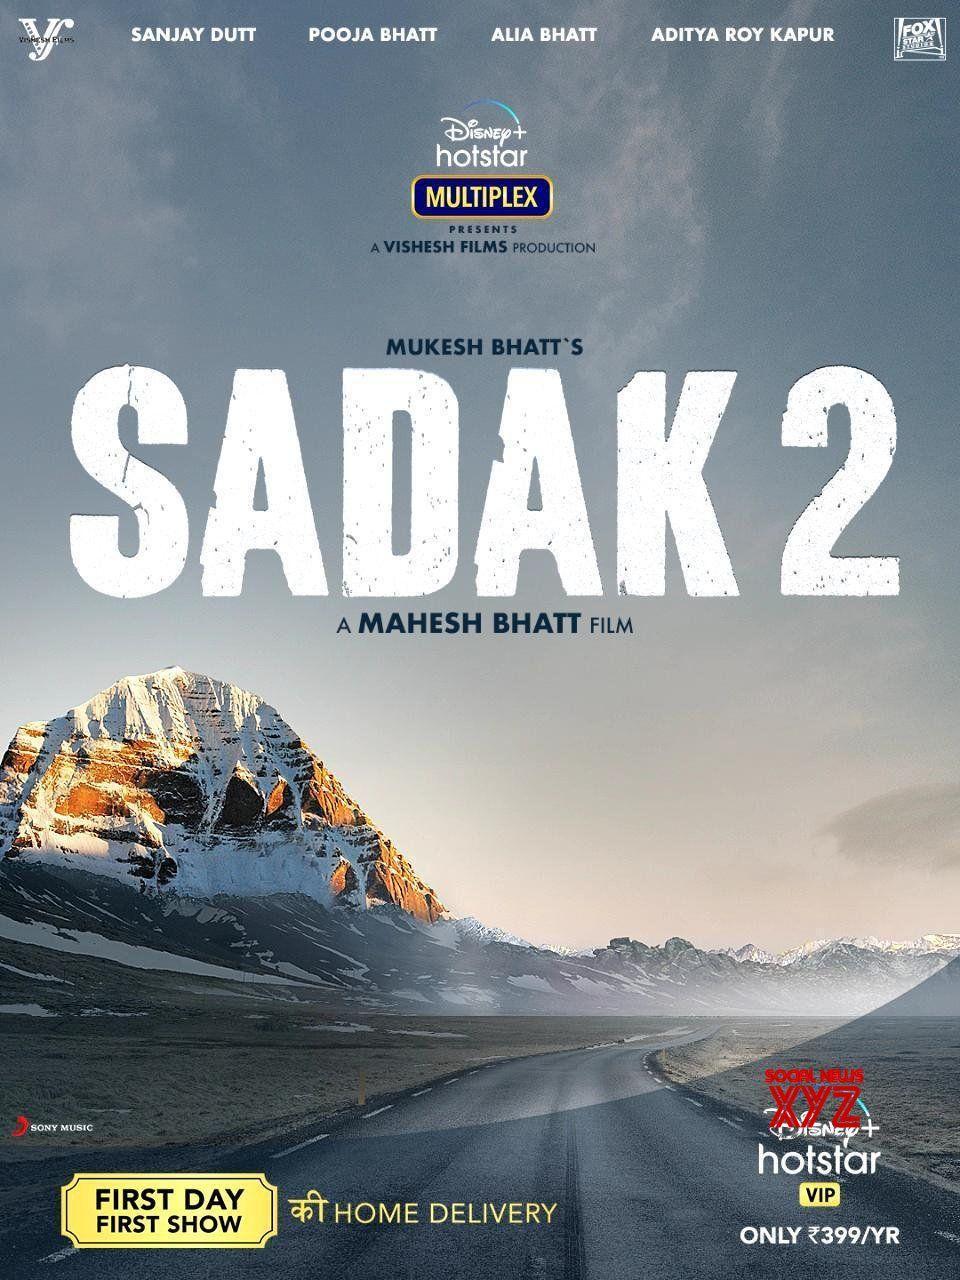 Mahesh Bhatt S Sadak 2 Only On Disney Plus Hotstar Vip With Disney Plus Hotstar Multiplex Social News Xyz In 2020 Disney Plus Movies To Watch Hindi 2 Movie